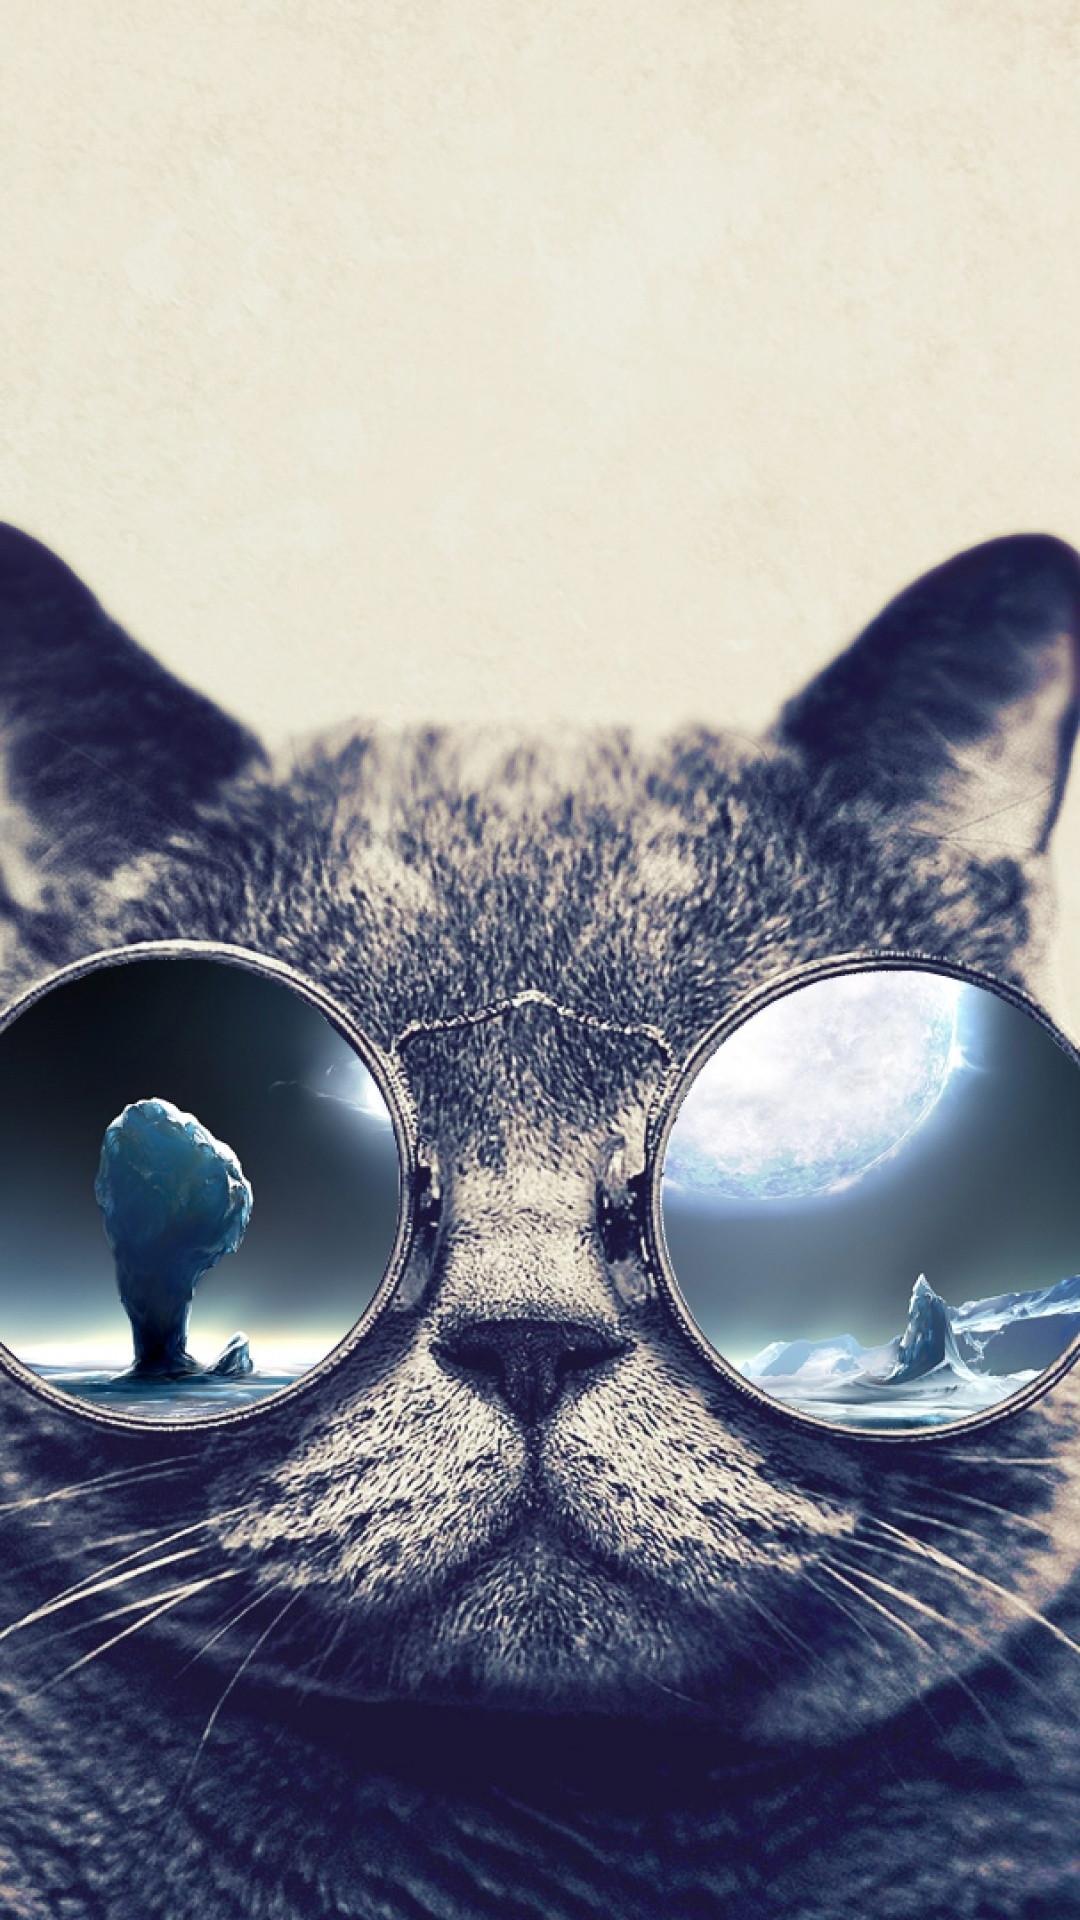 1175798 Download Free Grumpy Cat Iphone Wallpaper - Cool Cat Wallpaper For Iphone , HD Wallpaper & Backgrounds